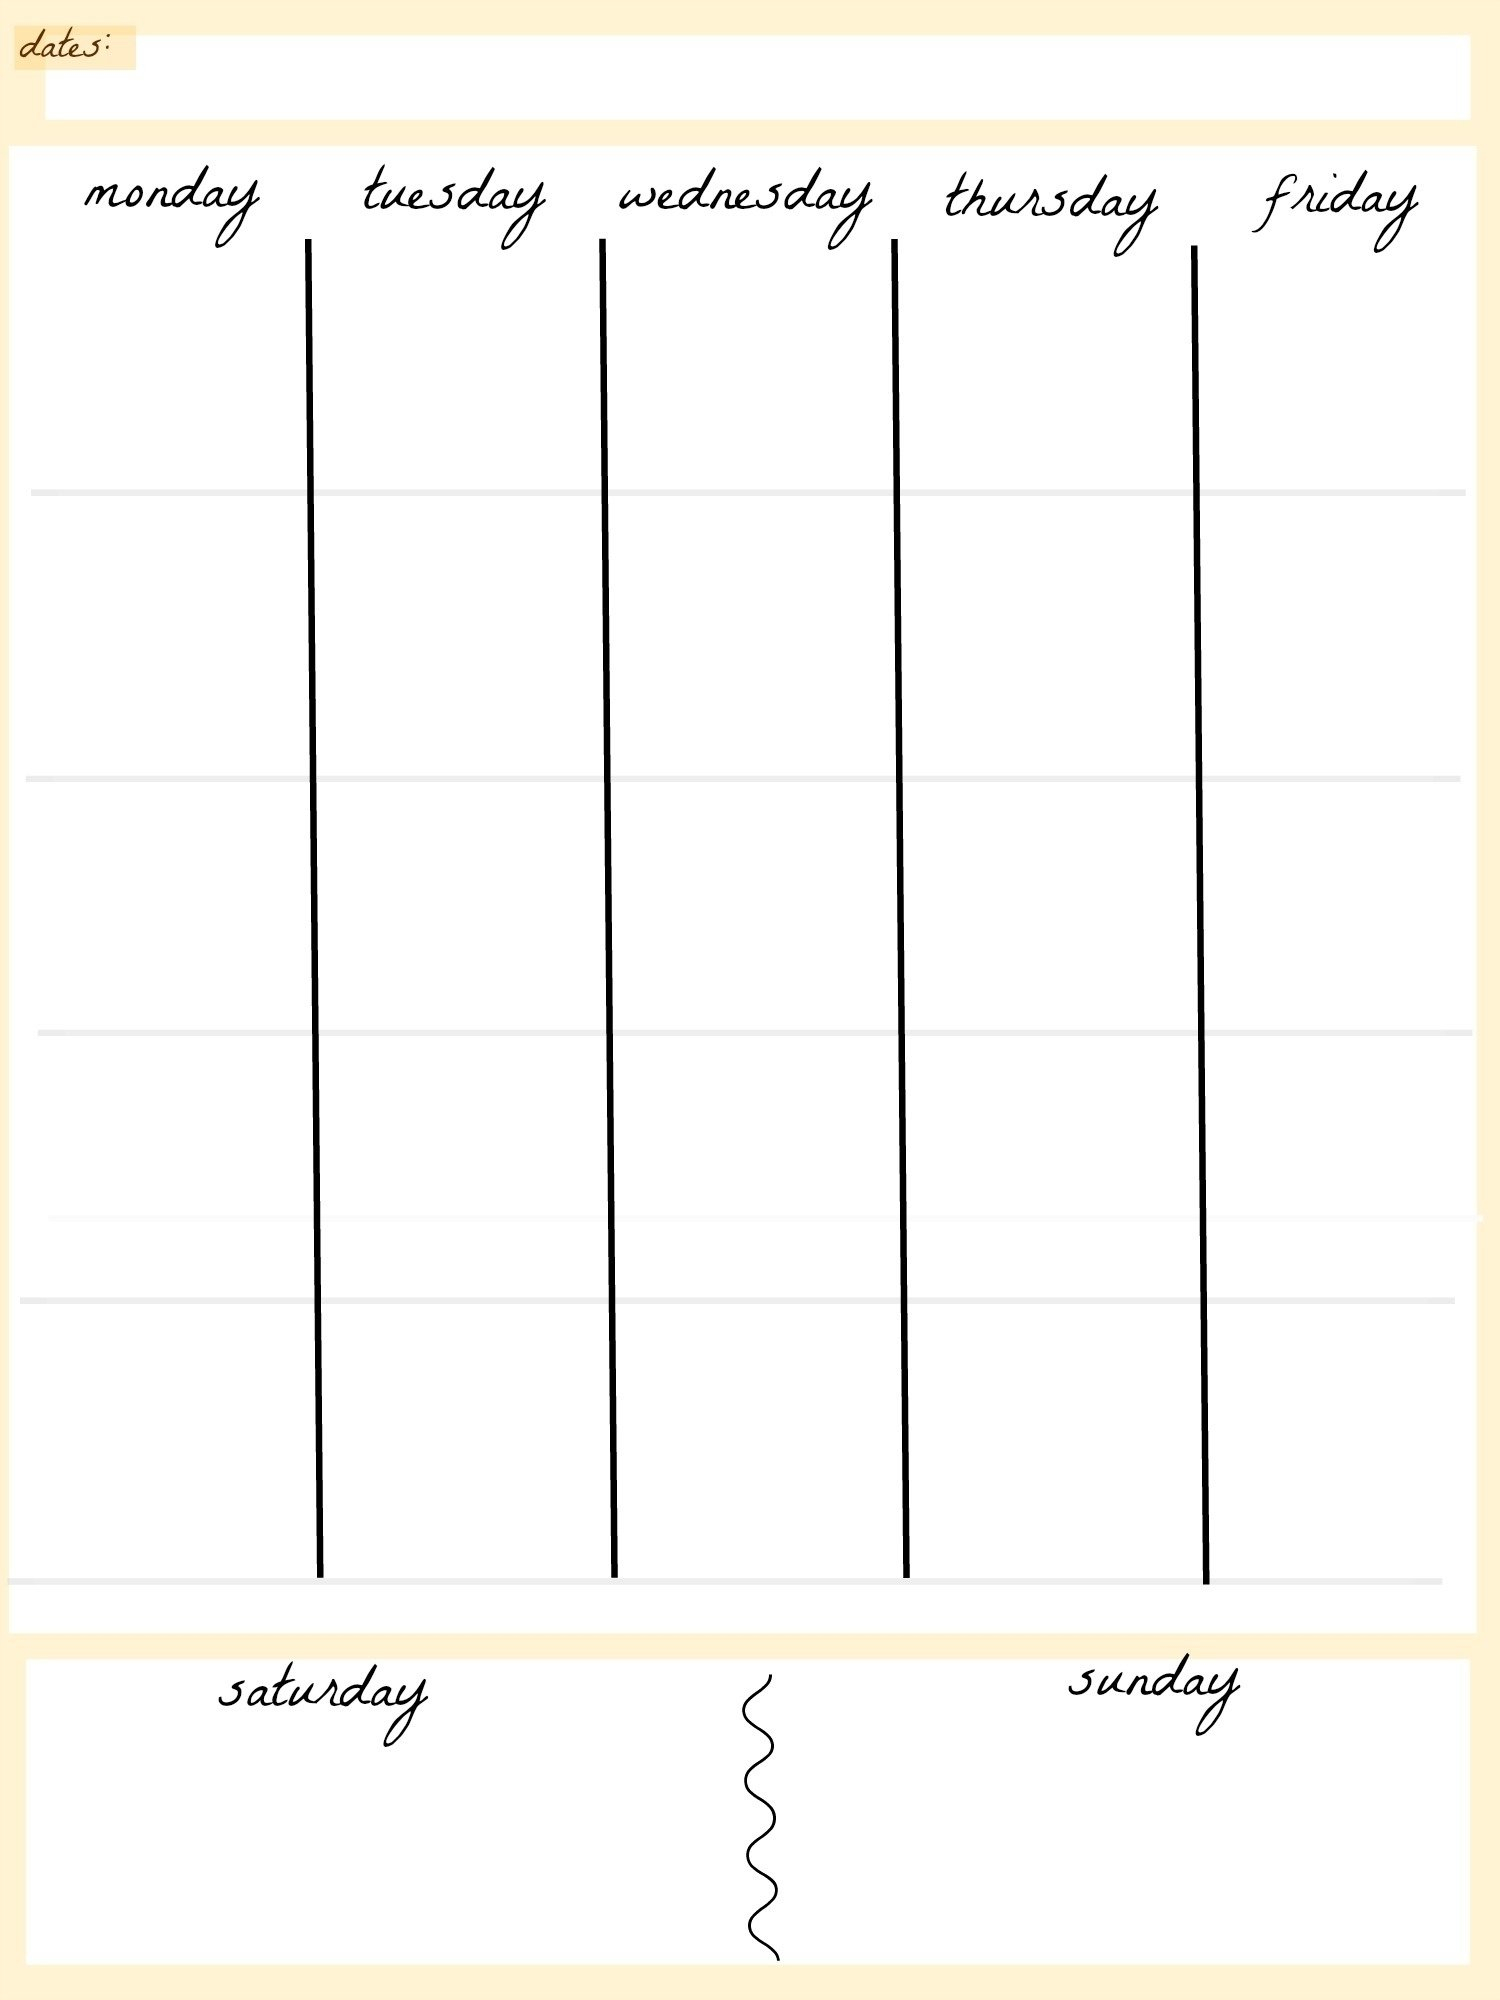 April 2019 – Page 2 – Template Calendar Design Blank Template For Two Week Calendar